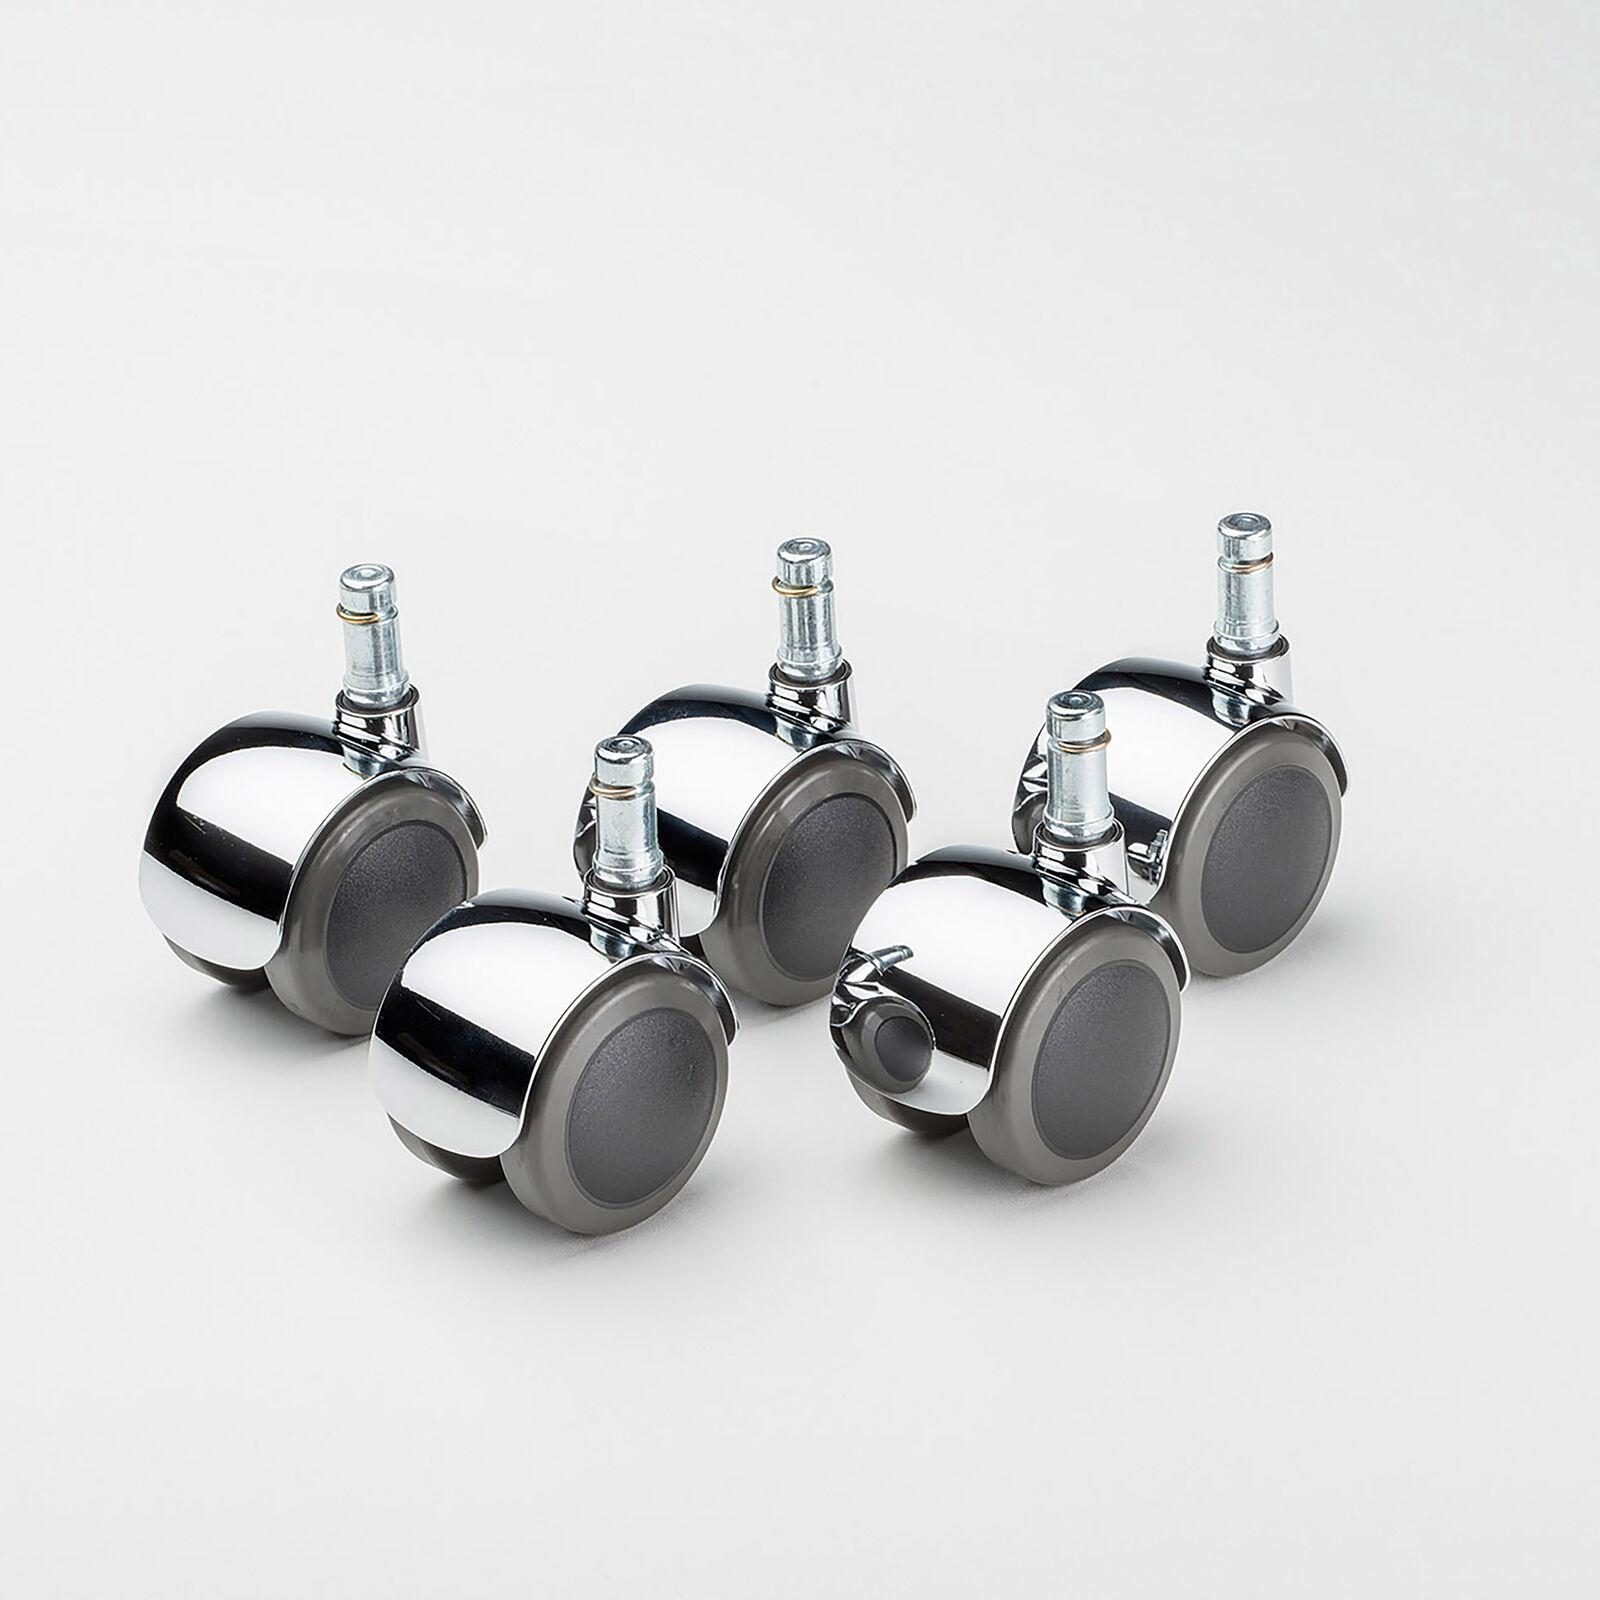 s l1600 - Vitra Set Rueda Giratoria para Eames-Produktreihe,Blanda Banda de Rodadura,5